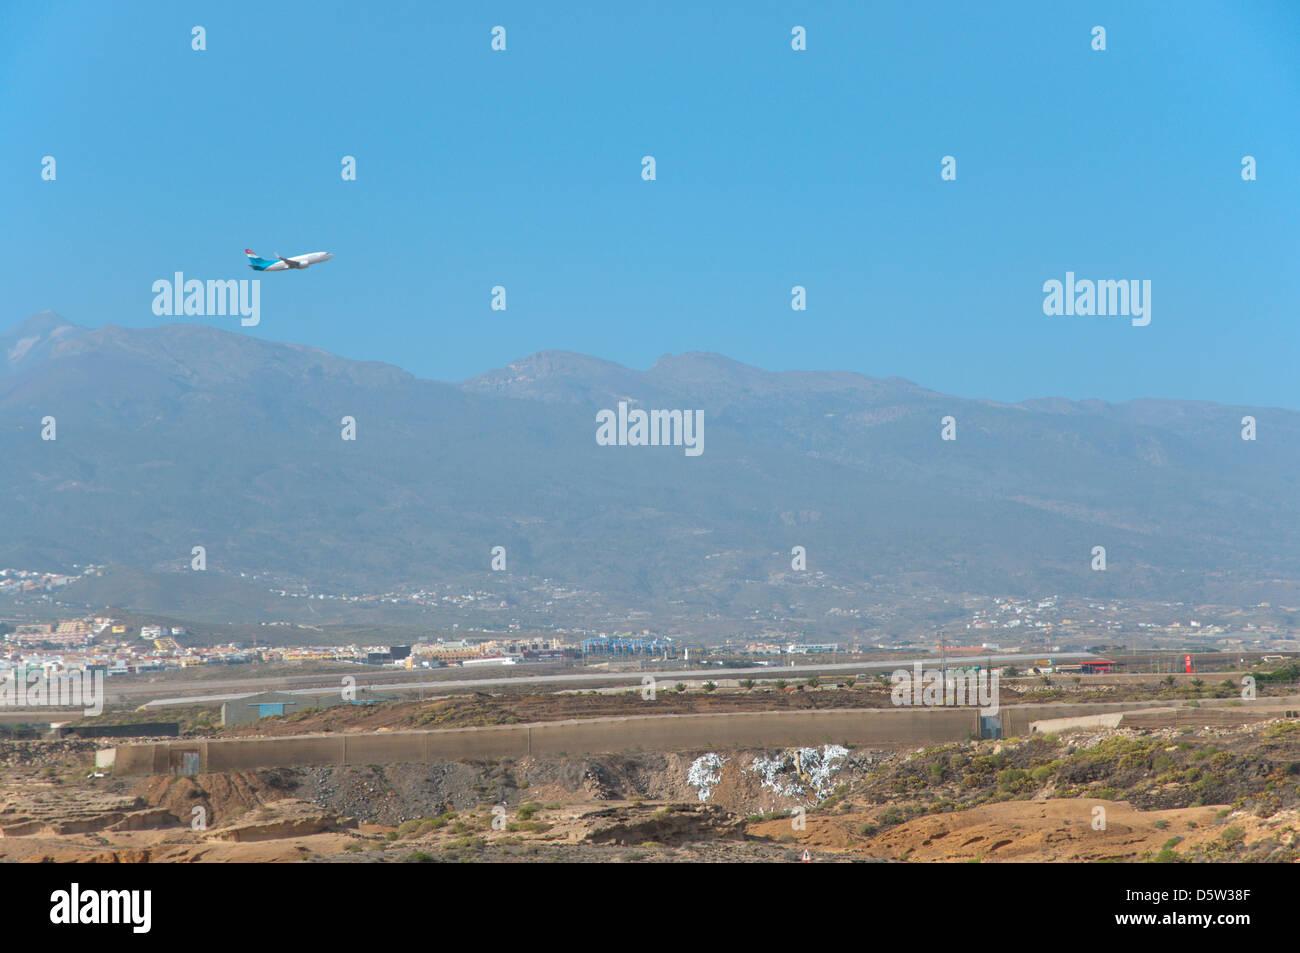 Aeroplane above El Medano town Tenerife island the Canary Islands Spain Europe - Stock Image